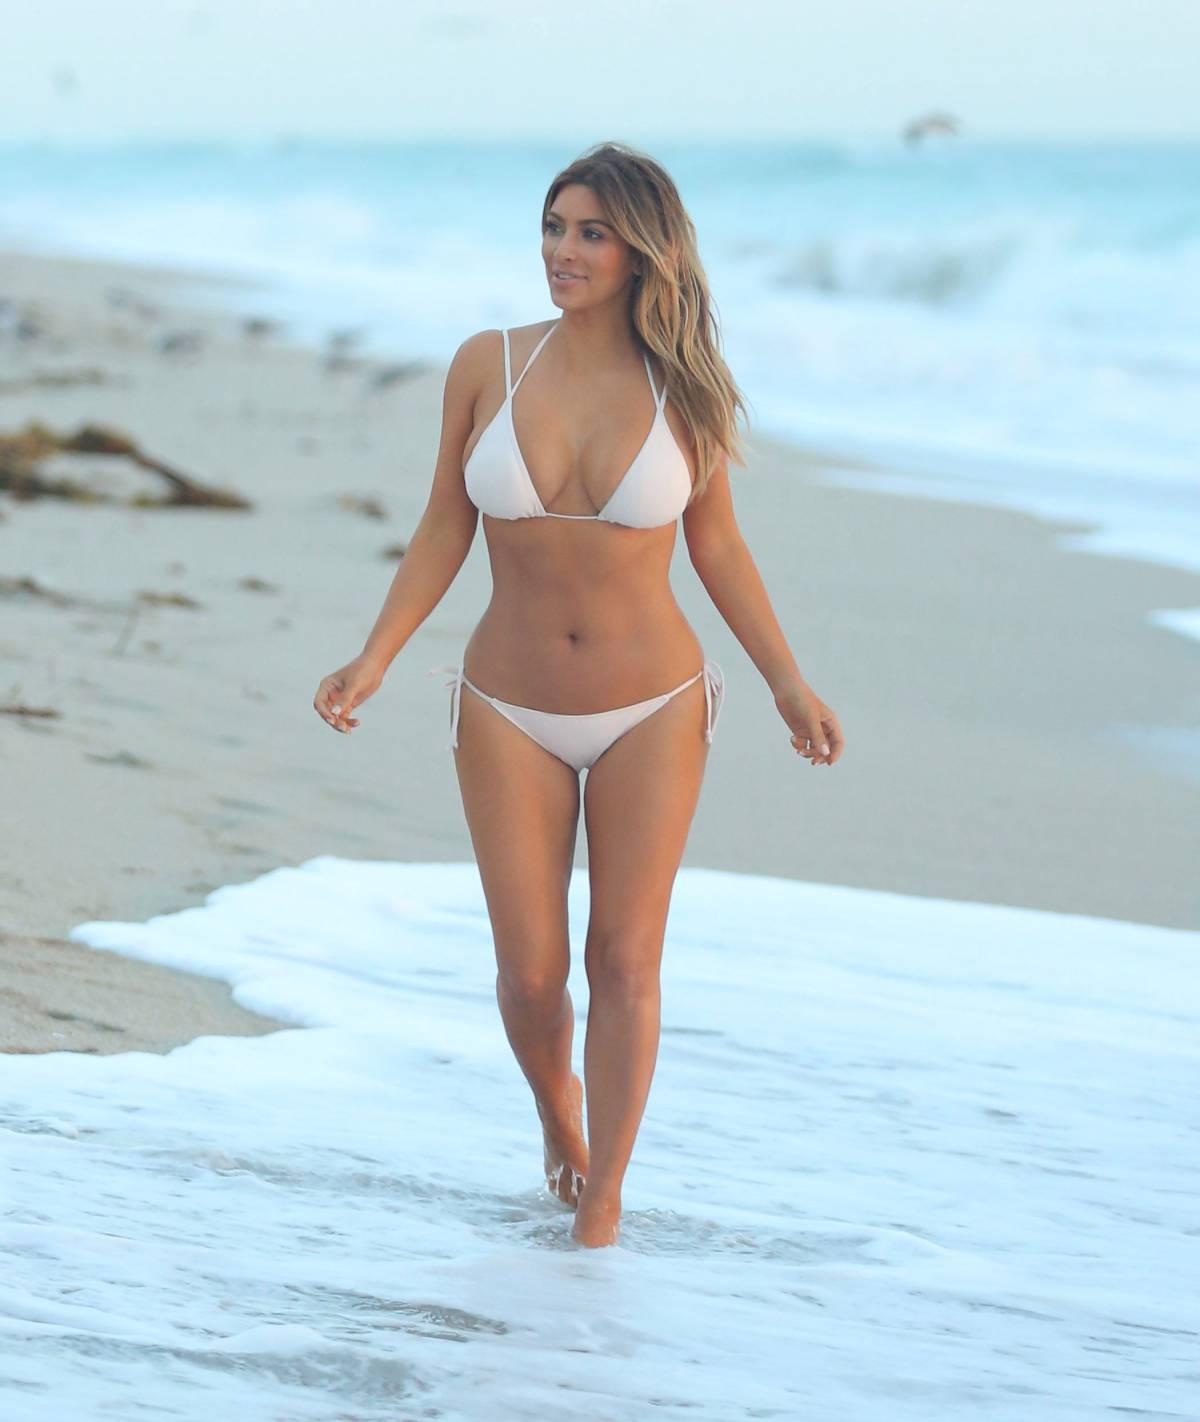 680827989_Kim_Kardashian_211213_ReSiDuO4_123_181lo.jpg